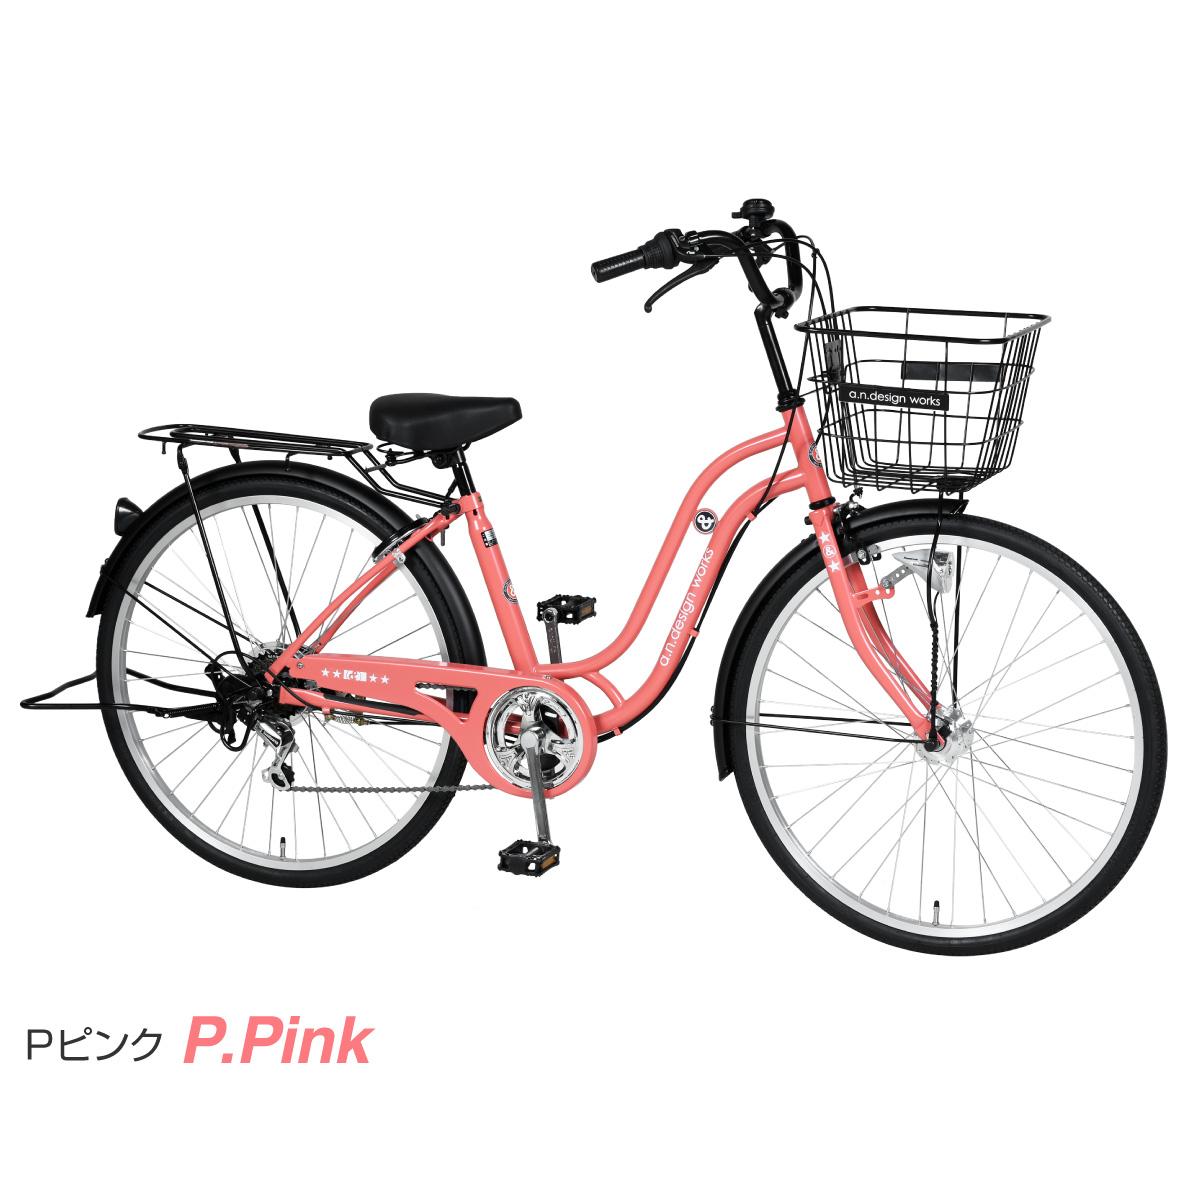 a.n.designworksSB266HD自転車26インチシティサイクルLEDオートライト6段変速ギア付おしゃれかわいいおすすめ通勤通学【完成品組立済】